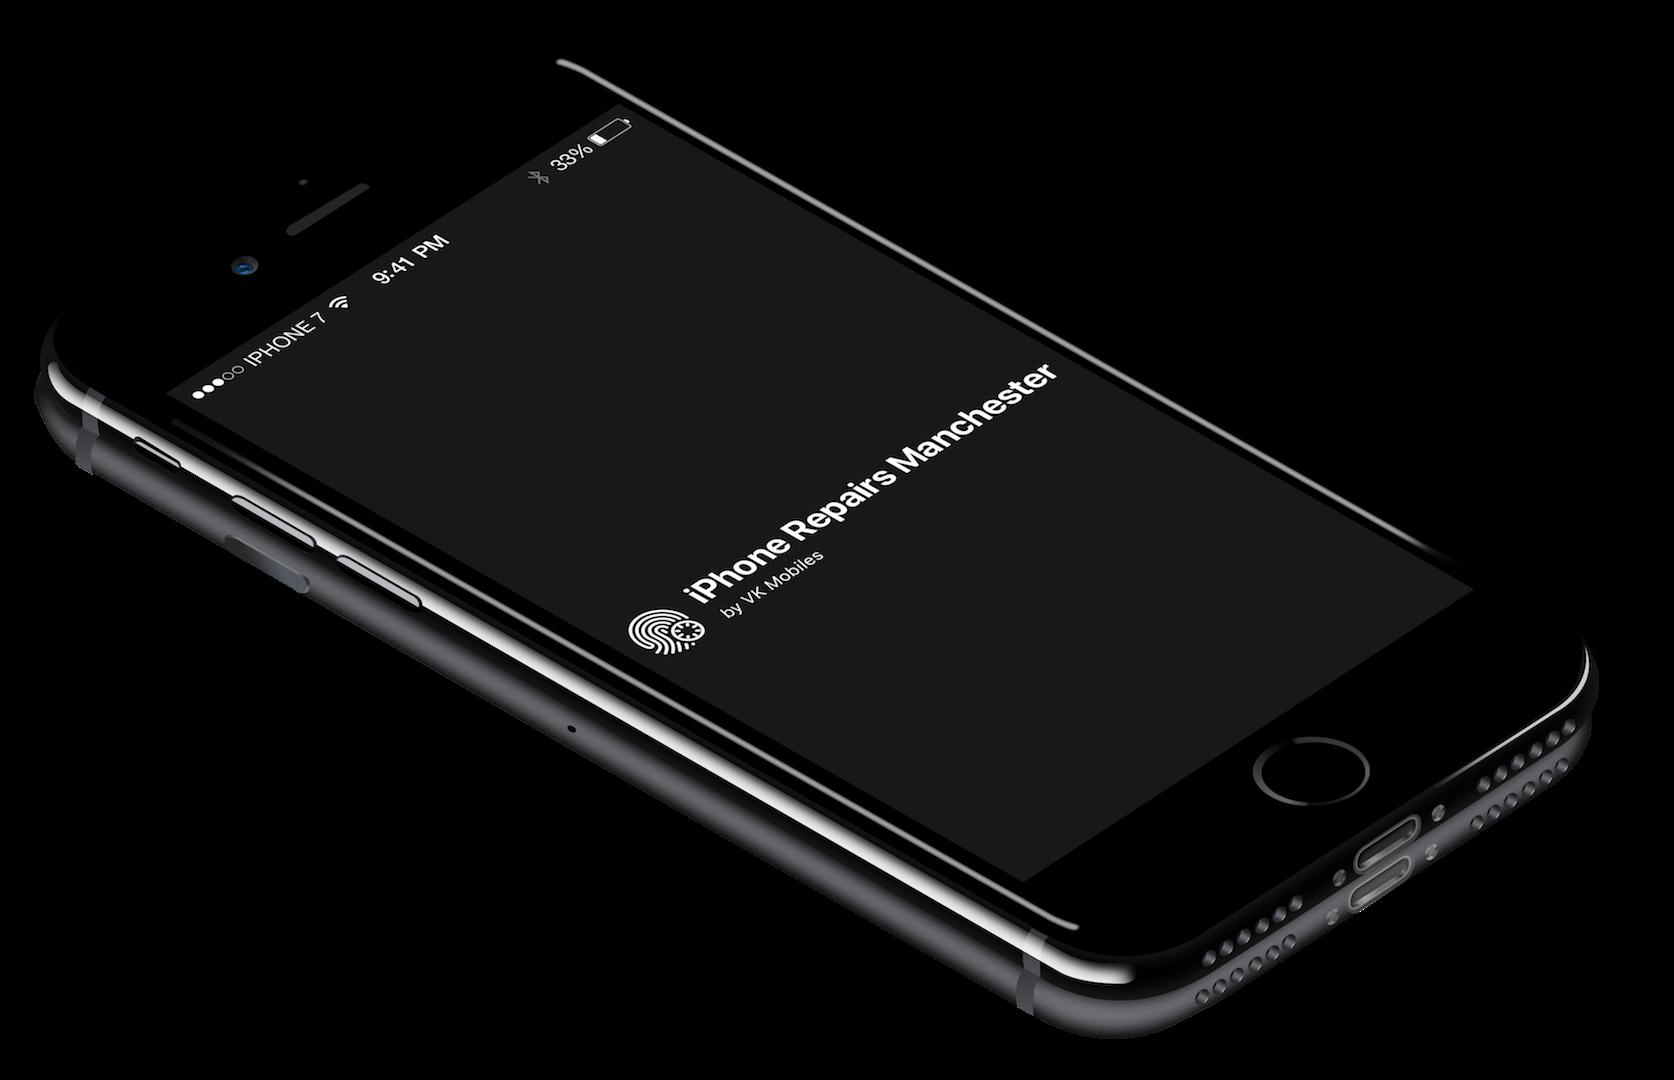 Iphone Repair Manchester